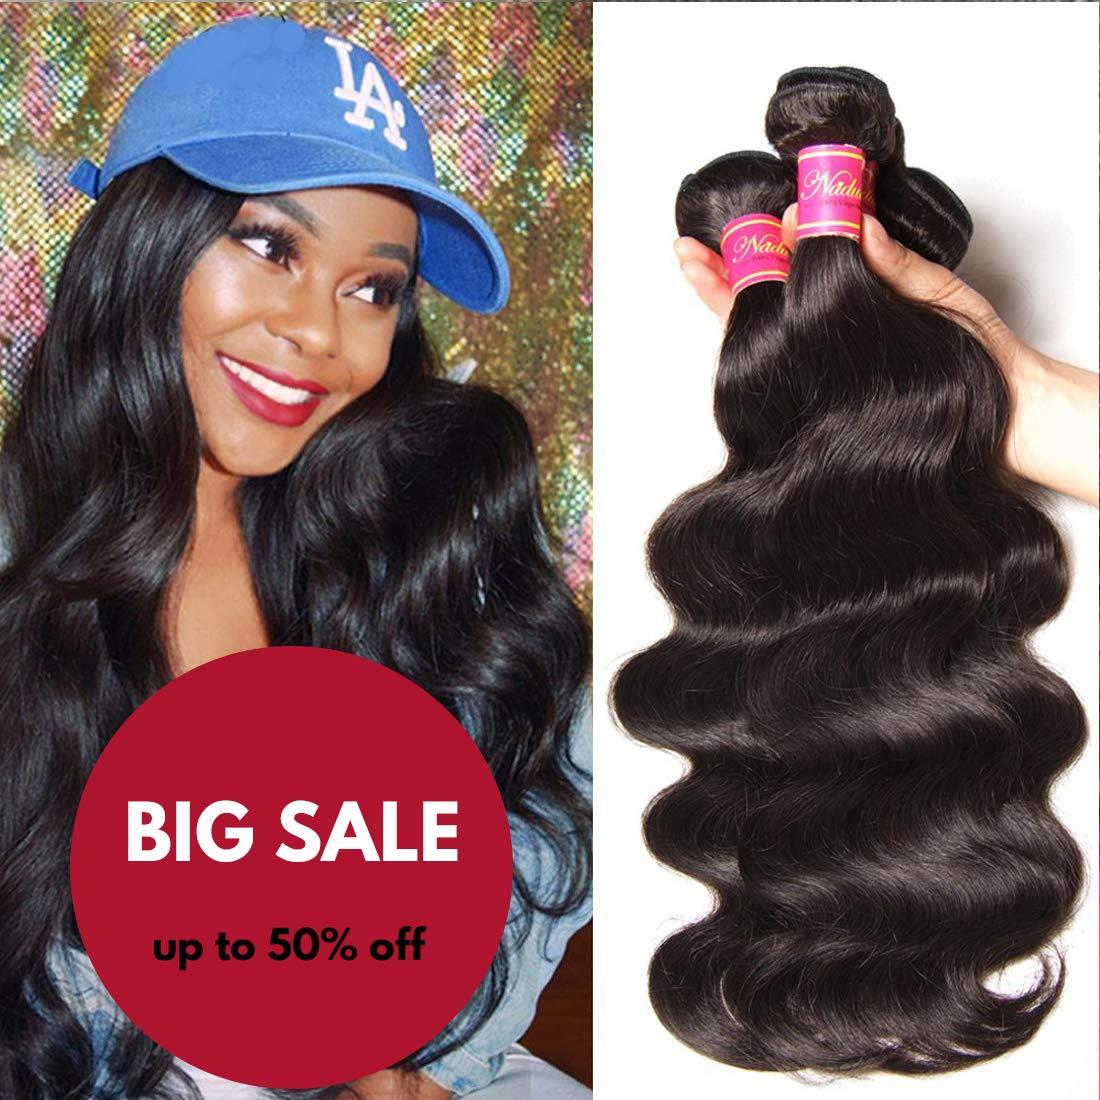 Nadula Hair 8a Best Quality Brazilian Body Wave Virgin Hair Extensions 3 Bundles 14 16 18 Brazilian Wavy Unprocessed Human Hair Weave Natural Color by Nadula